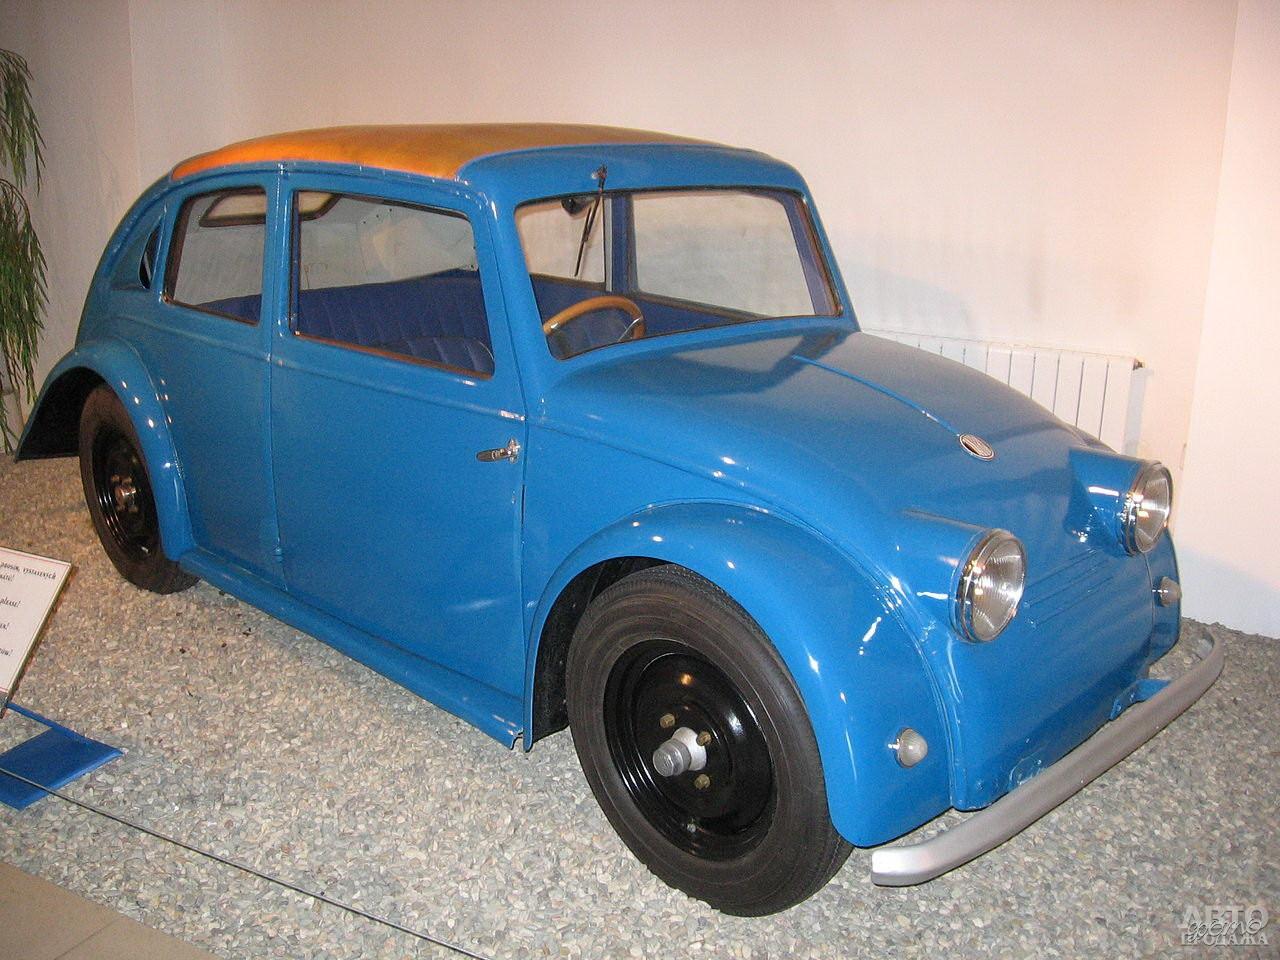 Прототип Tаtra V570 1933 года